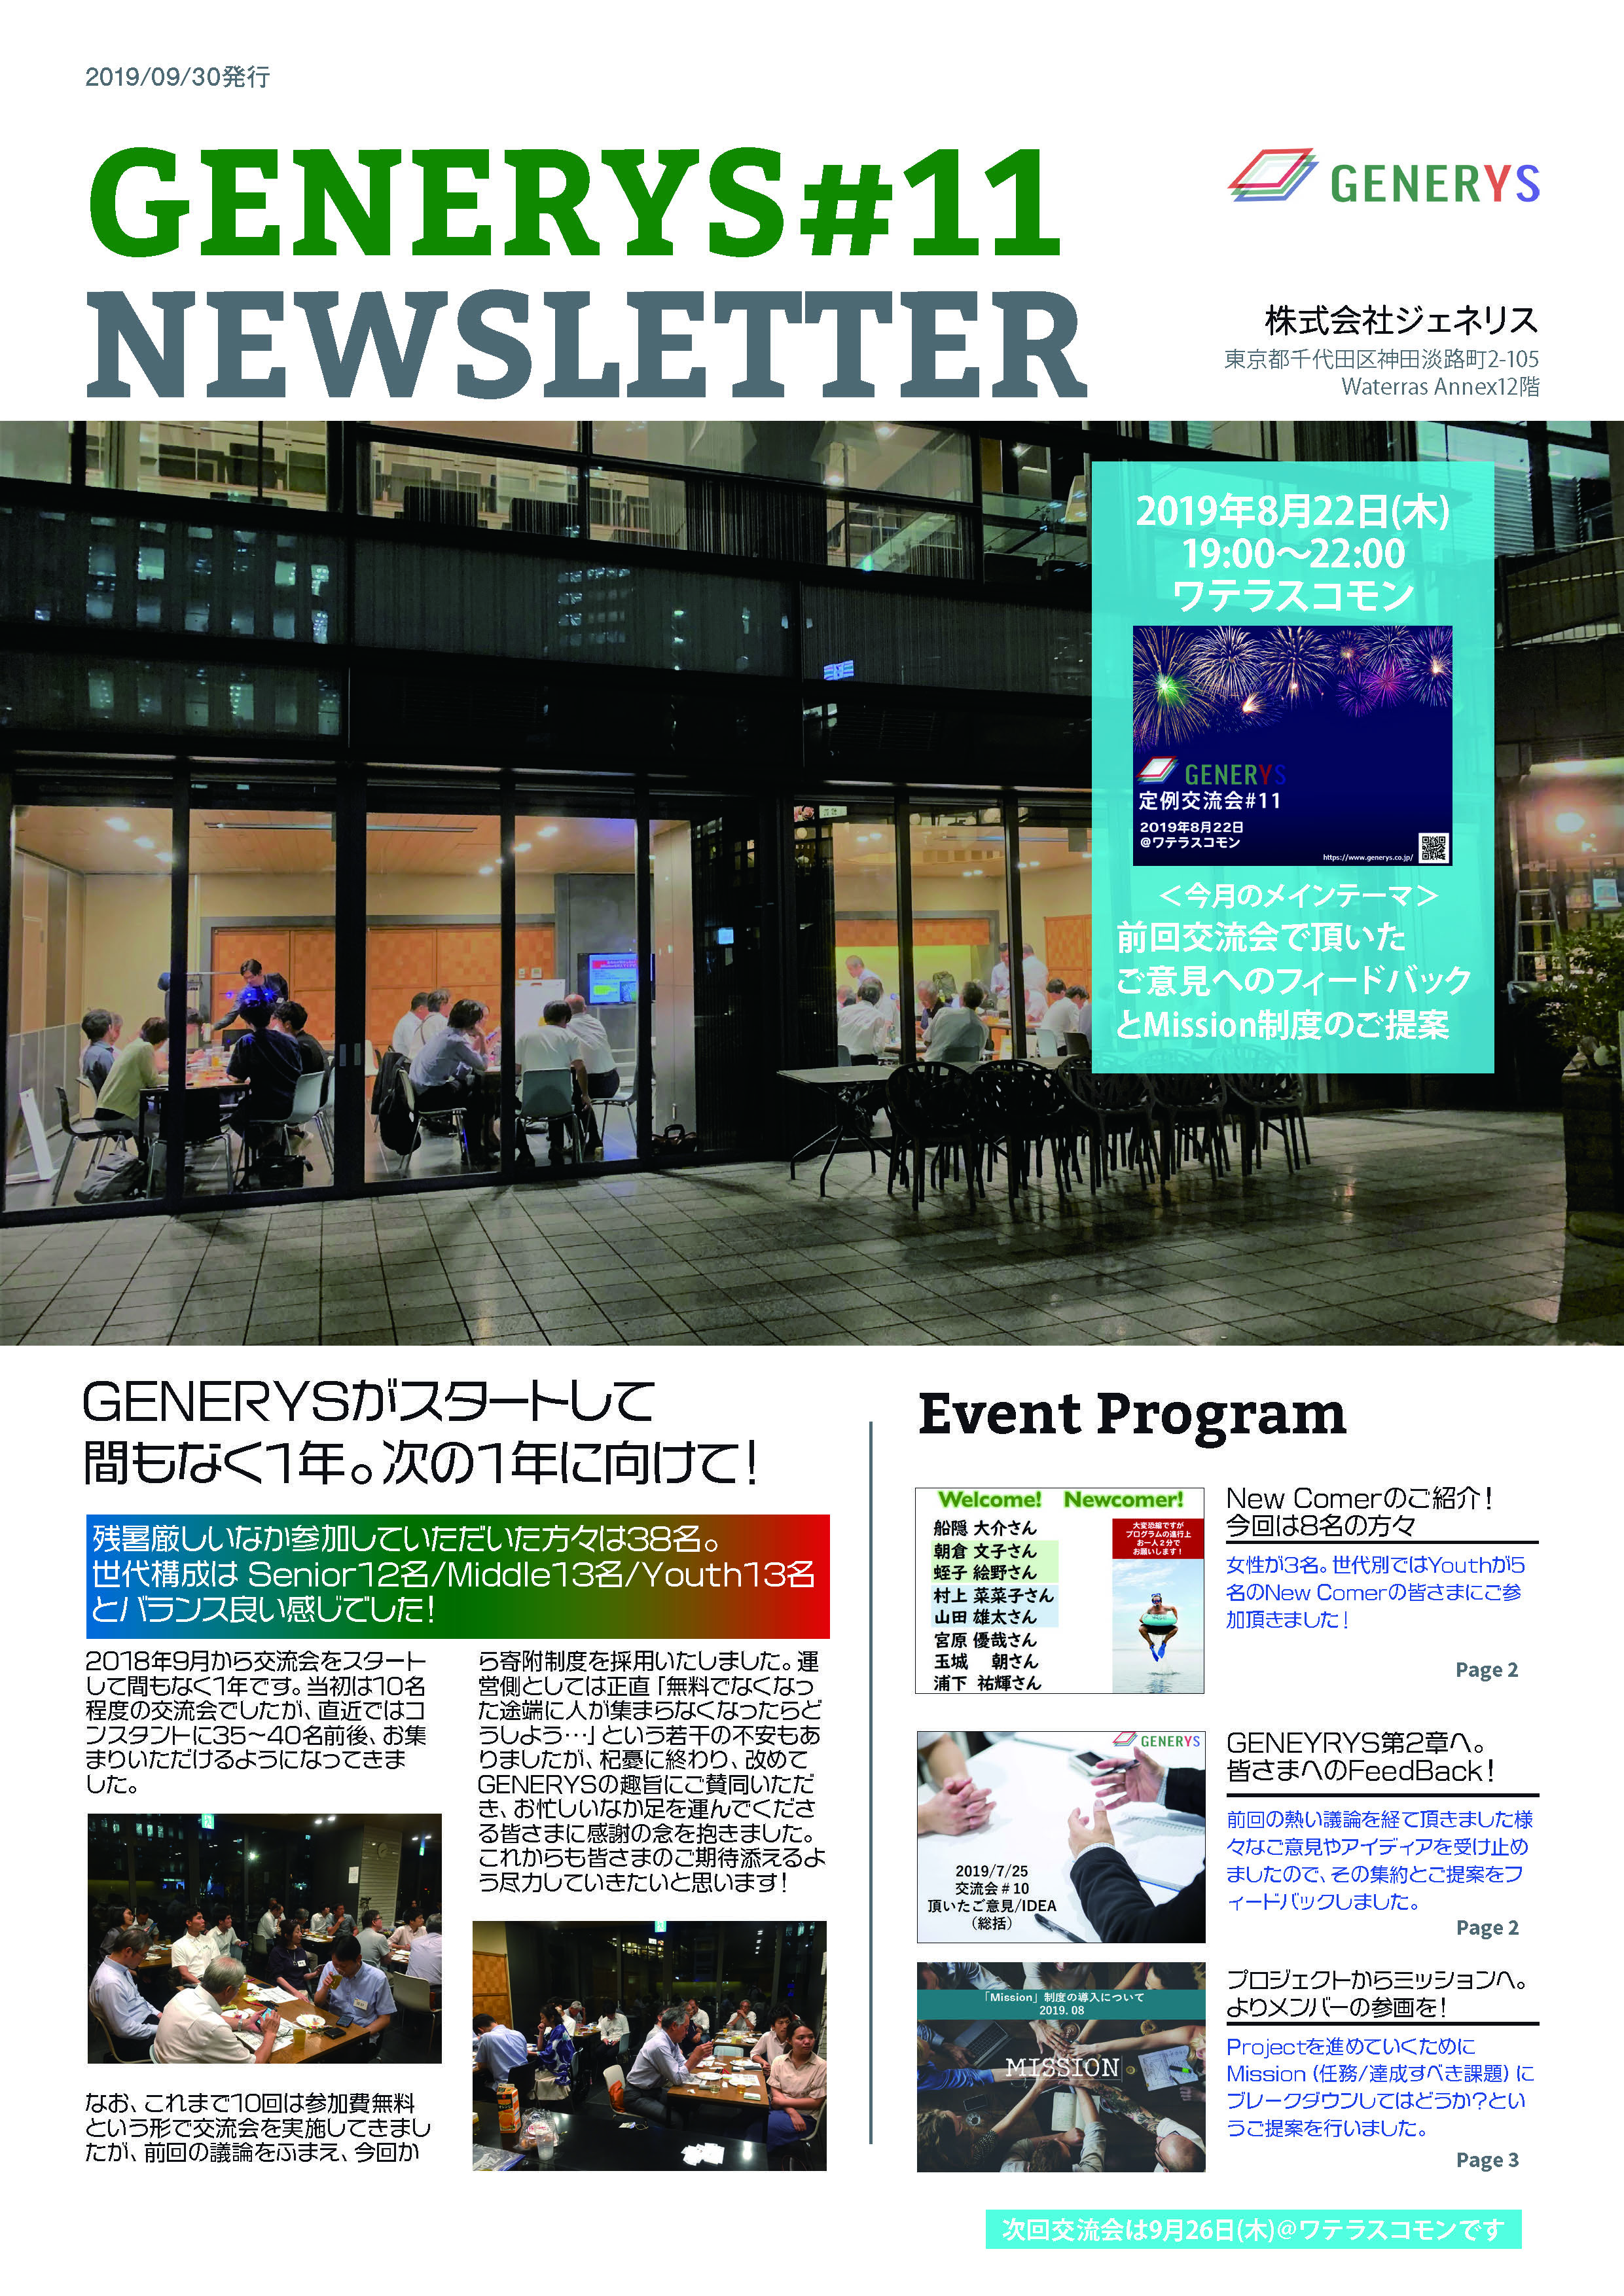 GENERYS交流会#11REPORT_ページ_1.jpg